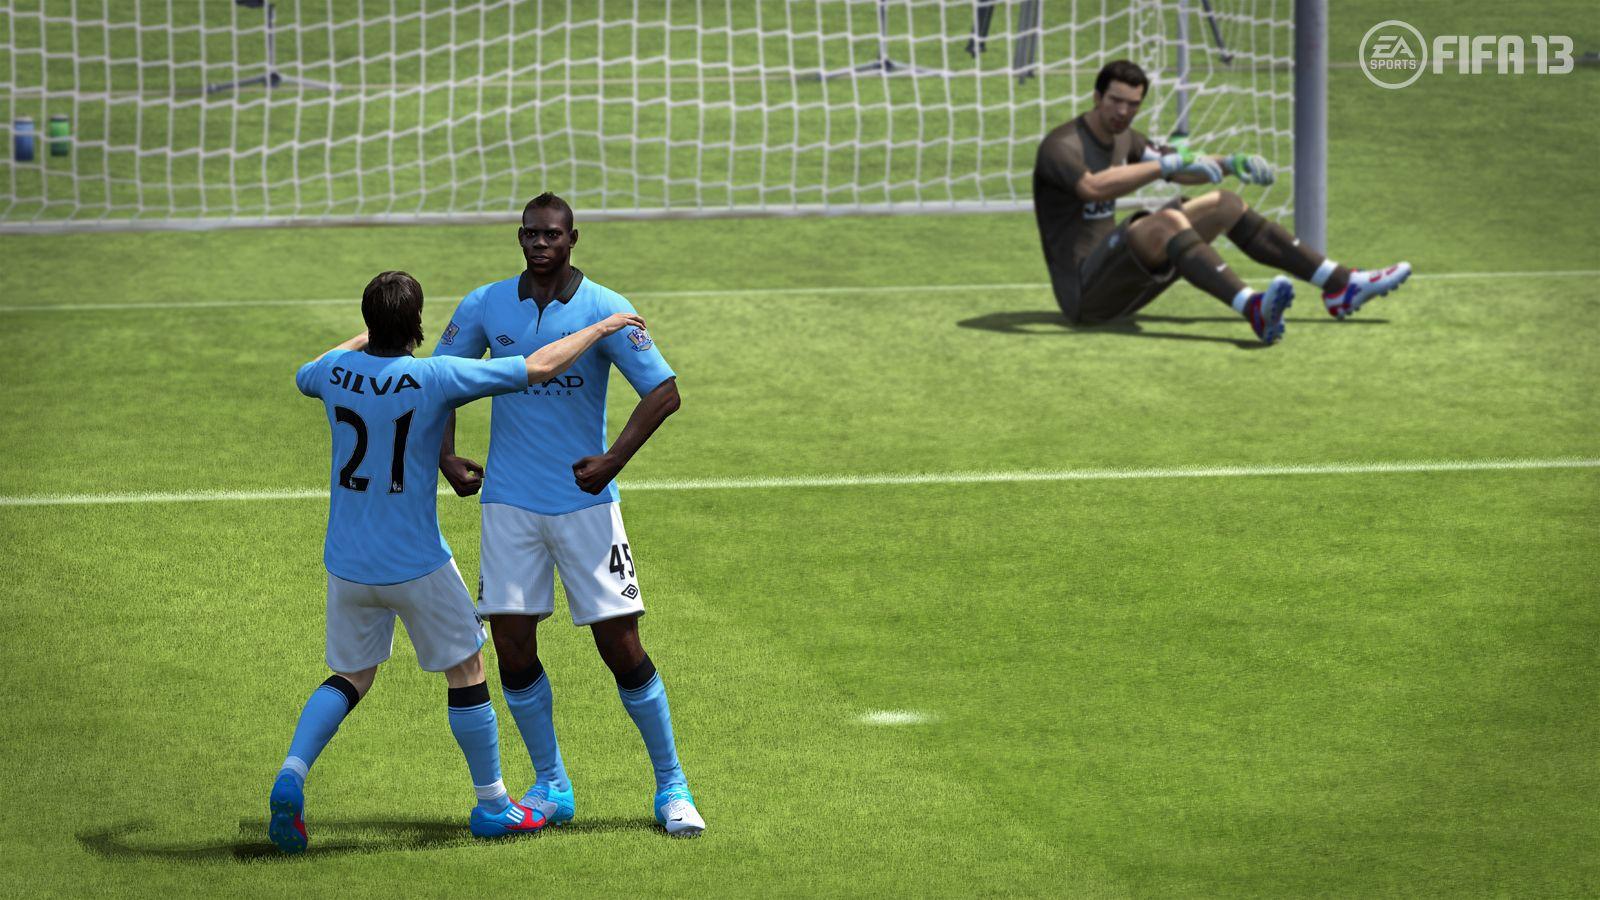 FIFA 13: dojmy z prezentace z Edenu 68895